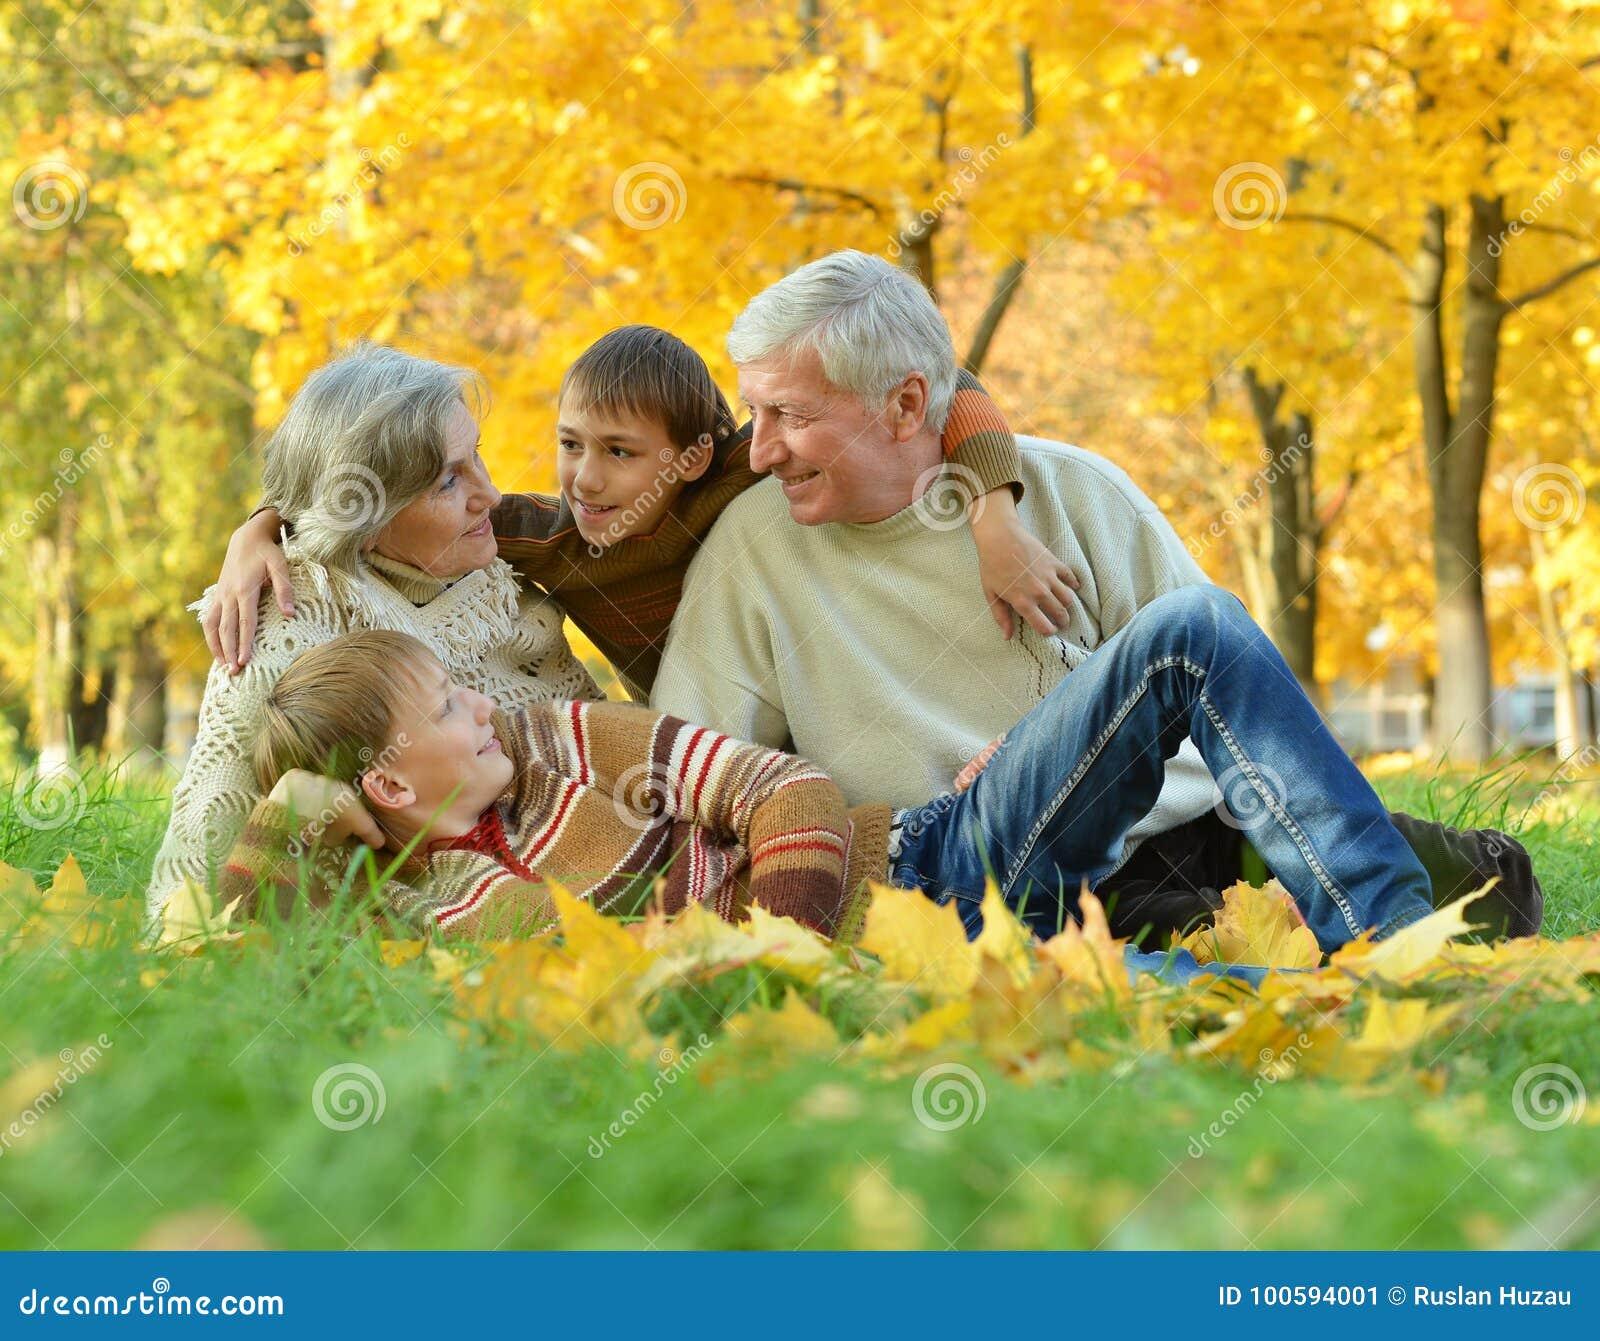 ce578424bb8 Παππούδες και γιαγιάδες με τα παιδιά στο πάρκο Στοκ Εικόνα - εικόνα ...